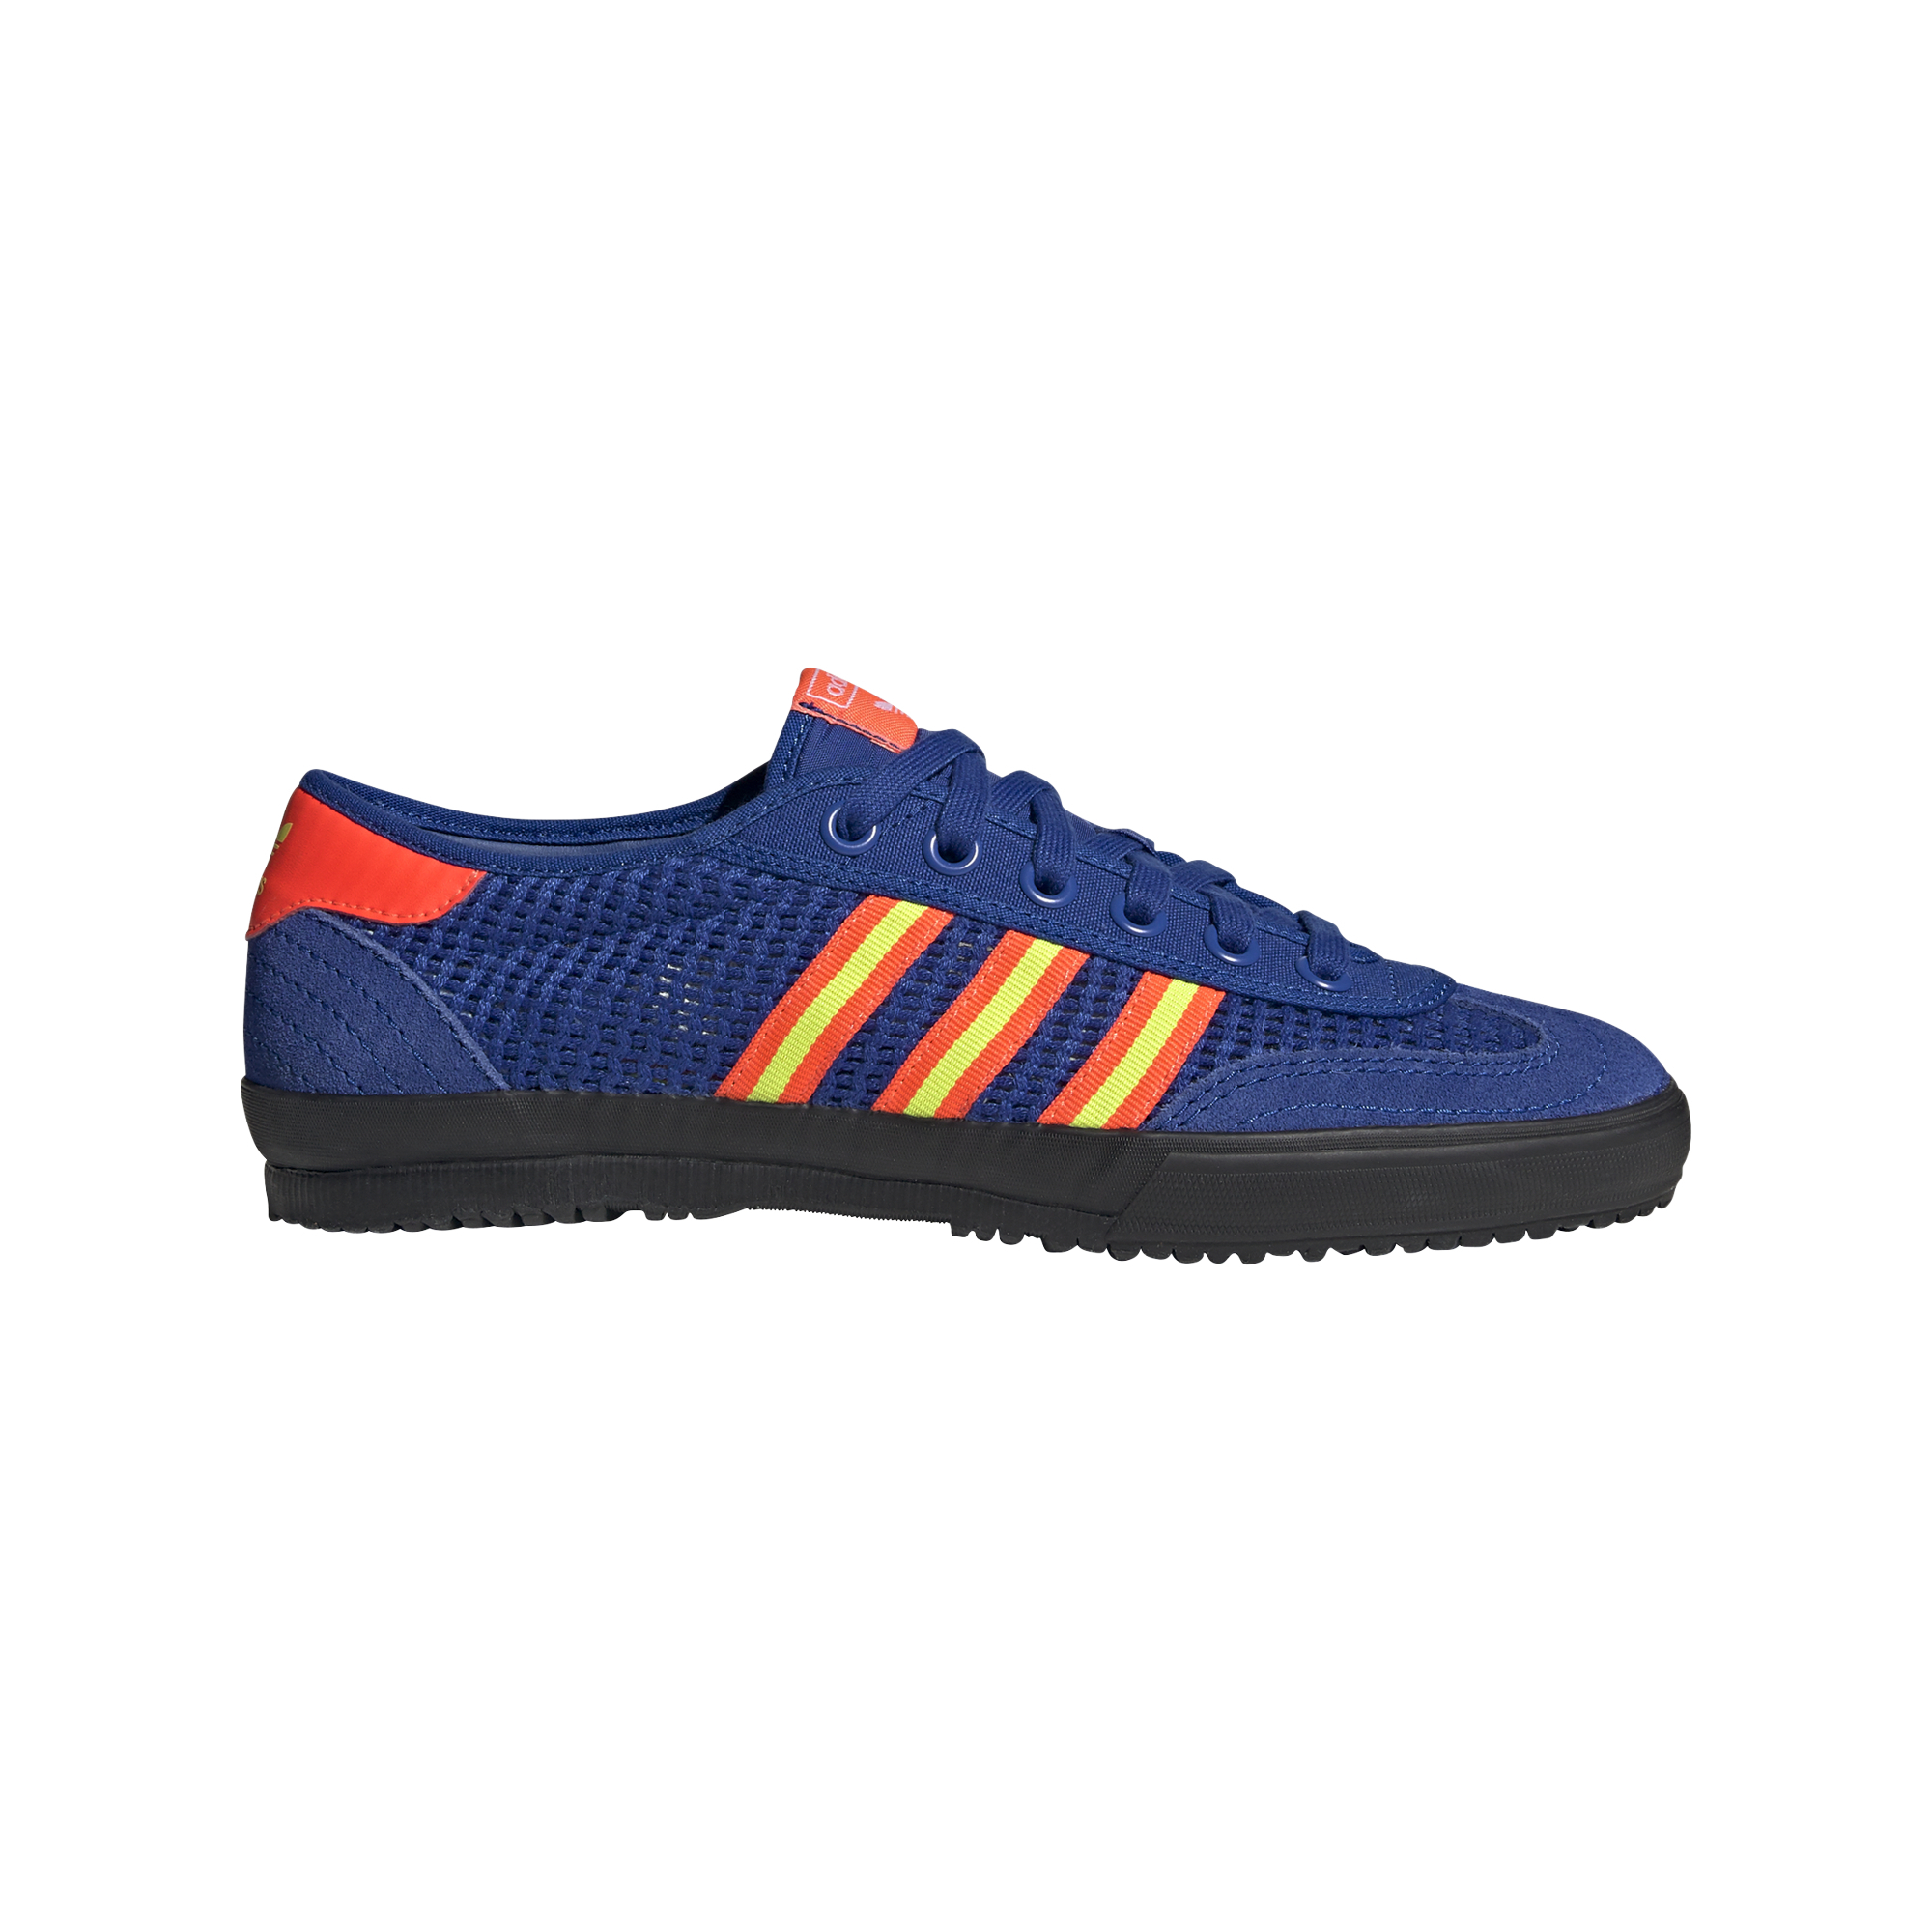 adidas Tischtennis Royal Blue/ Solar Red/ Semi Yellow